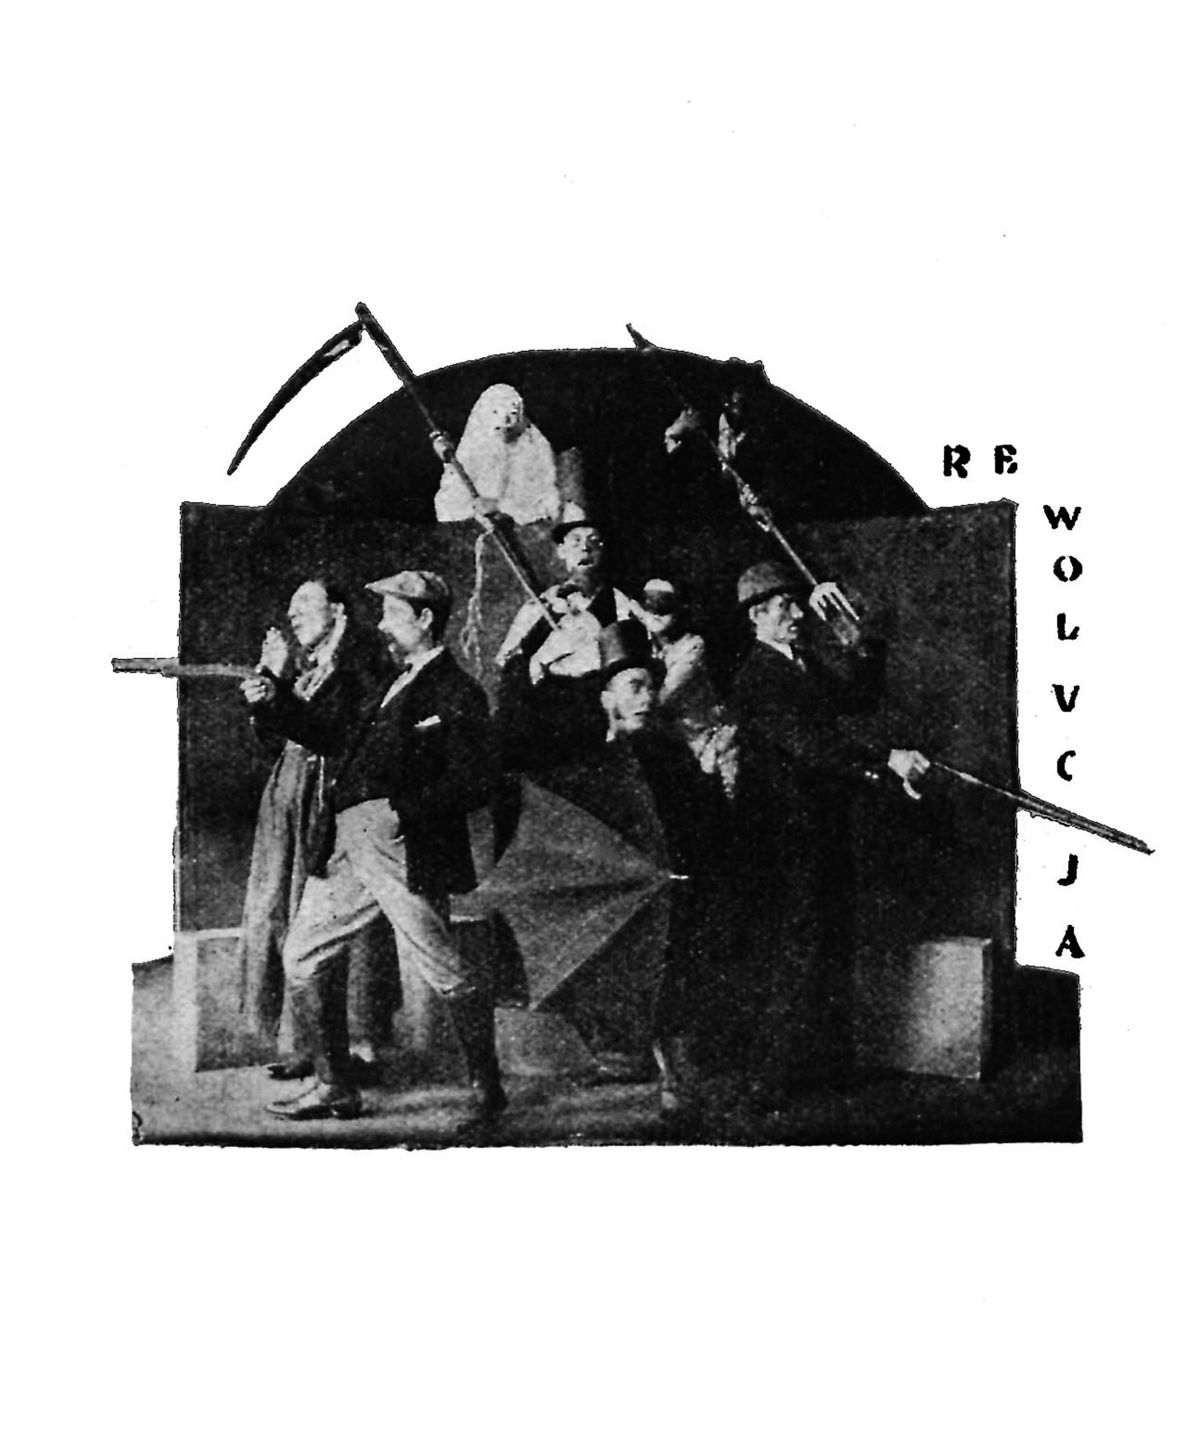 <i>A Play on Herod</i>, dir. Witold Wandurski, Łódzka Scena Robotnicza, premiere: 16 Feb. 1926. Reproduction from play's printed version. Source: Encyklopedia Teatru Polskiego.